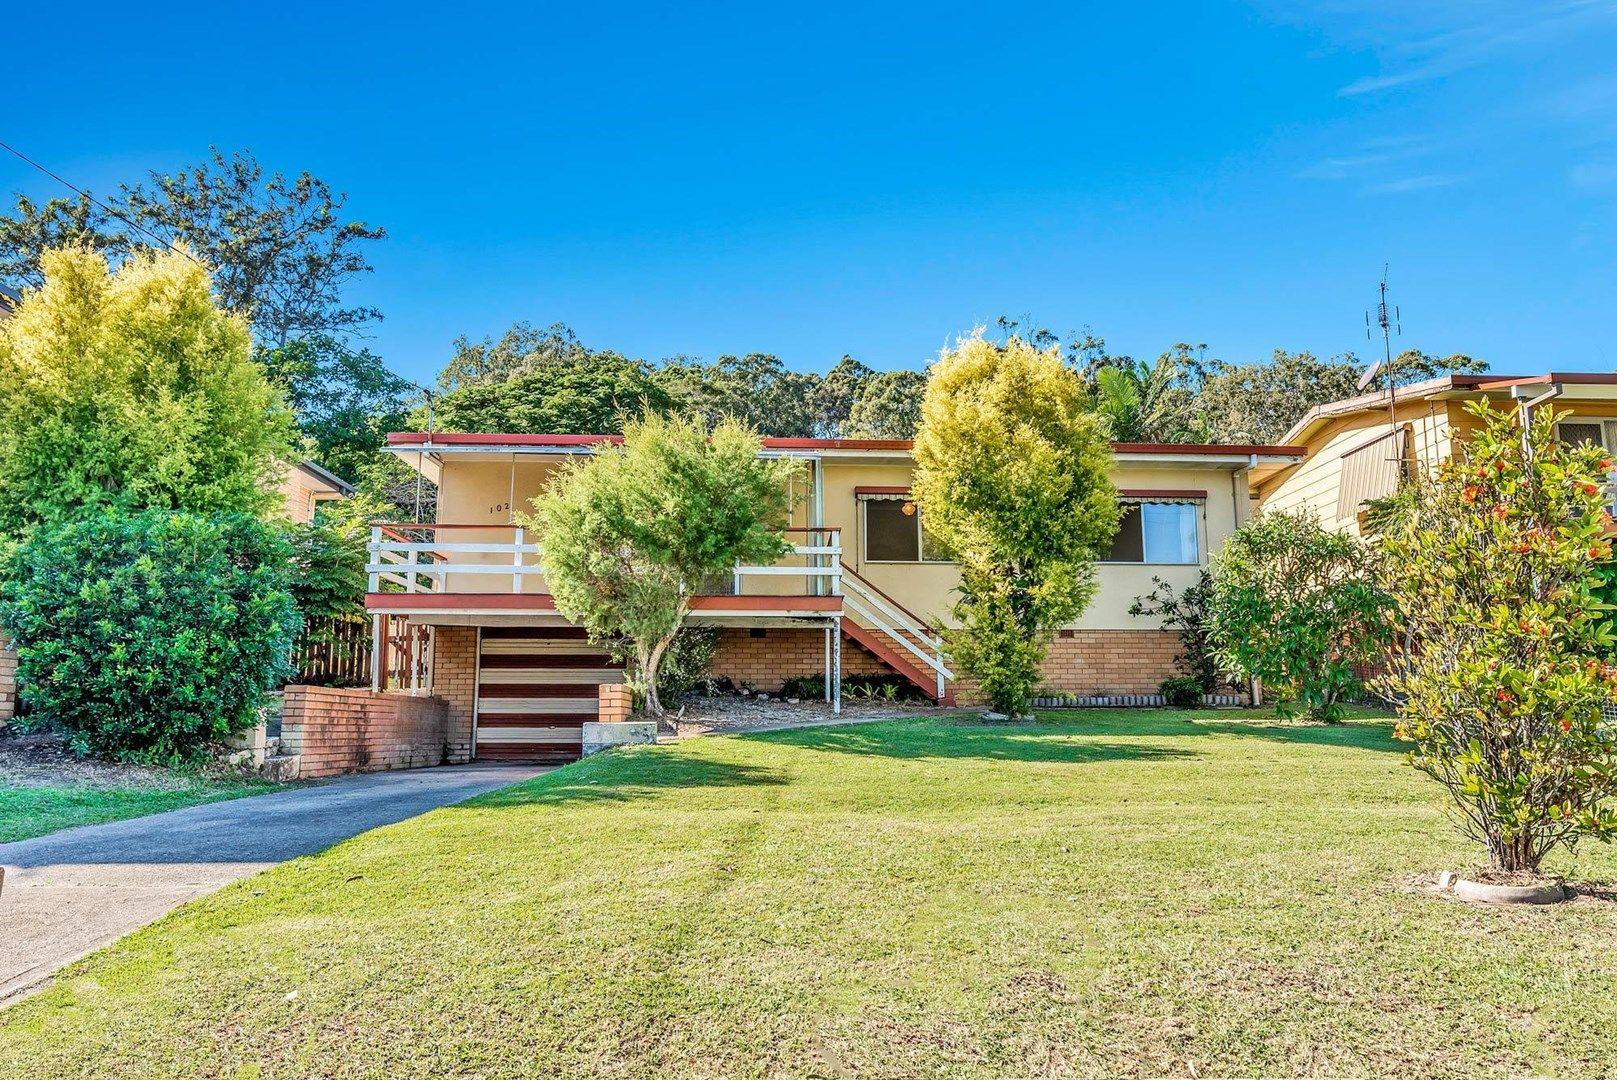 102 West Burleigh Road, Burleigh Heads QLD 4220, Image 0